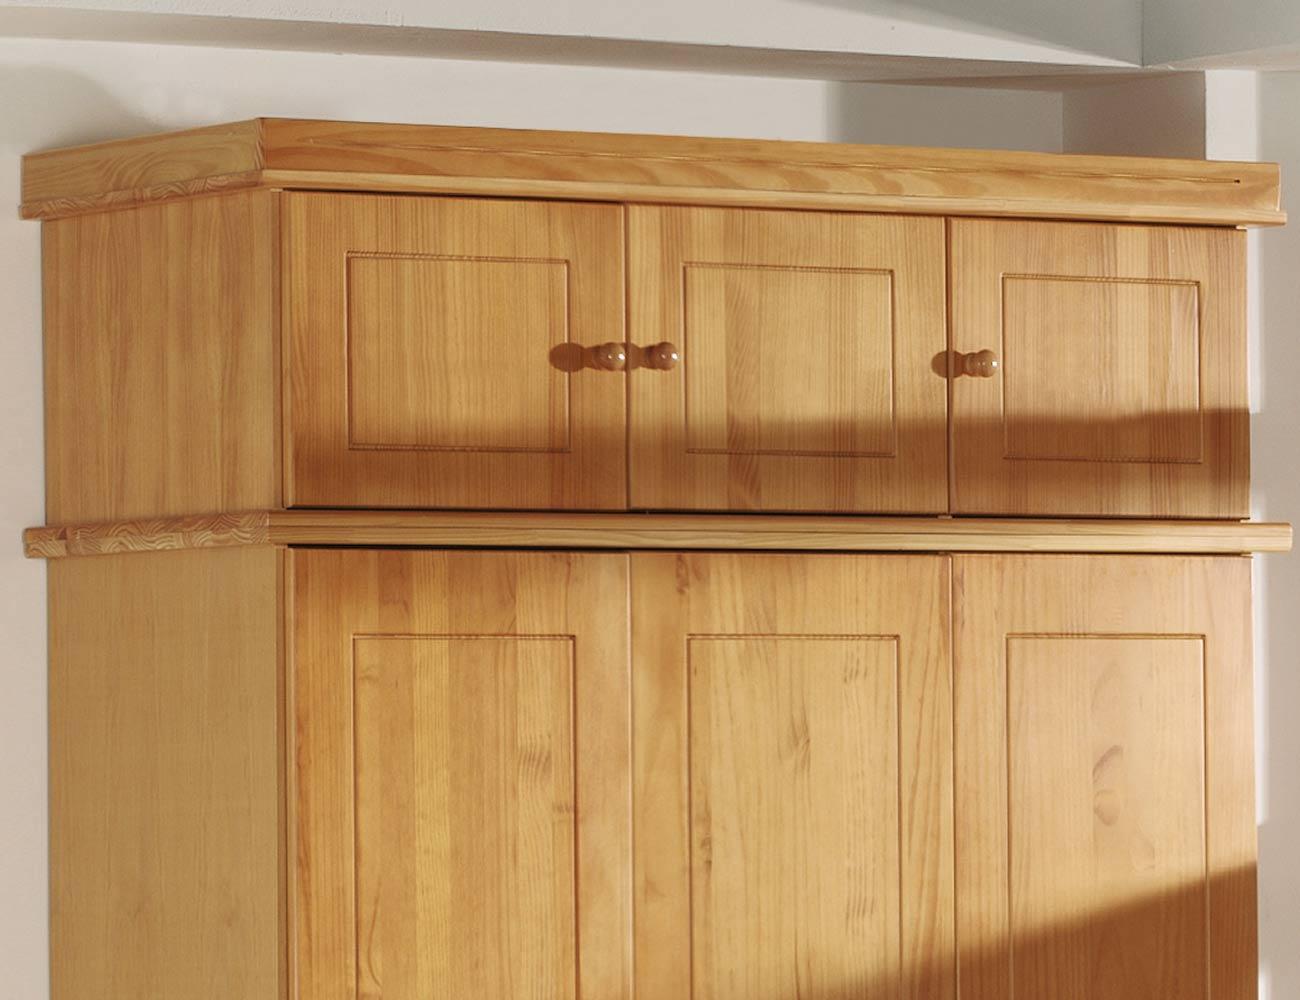 Muebles de pino color miel beautiful mueble de mimbre for Mueble zapatero de pino